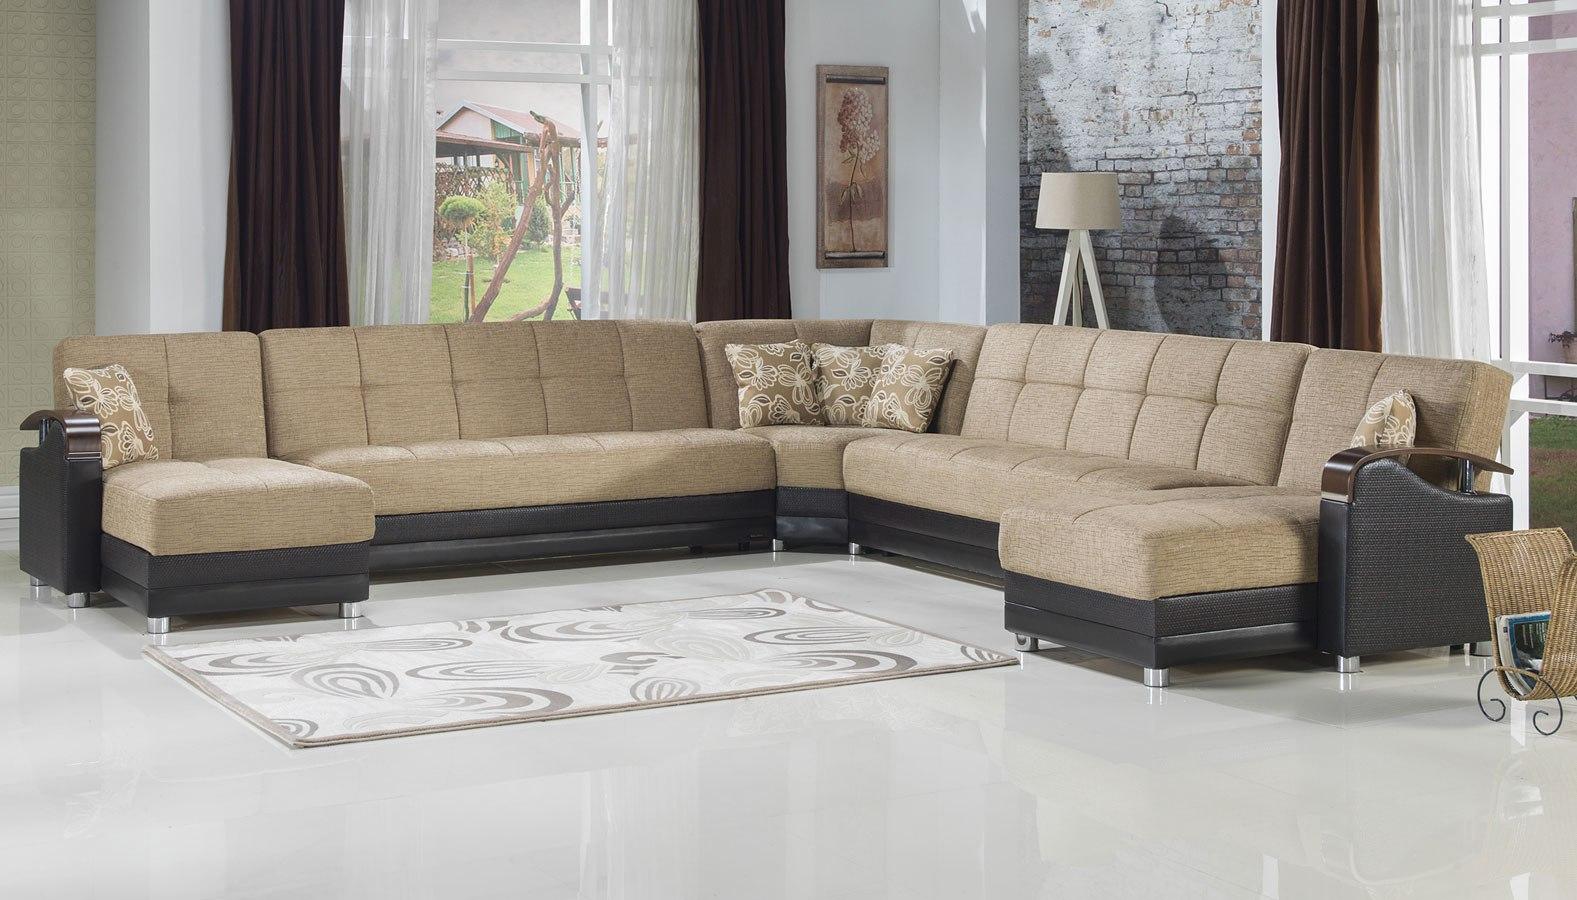 Luna Modular Sectional Fulya Brown By Istikbal Furniture